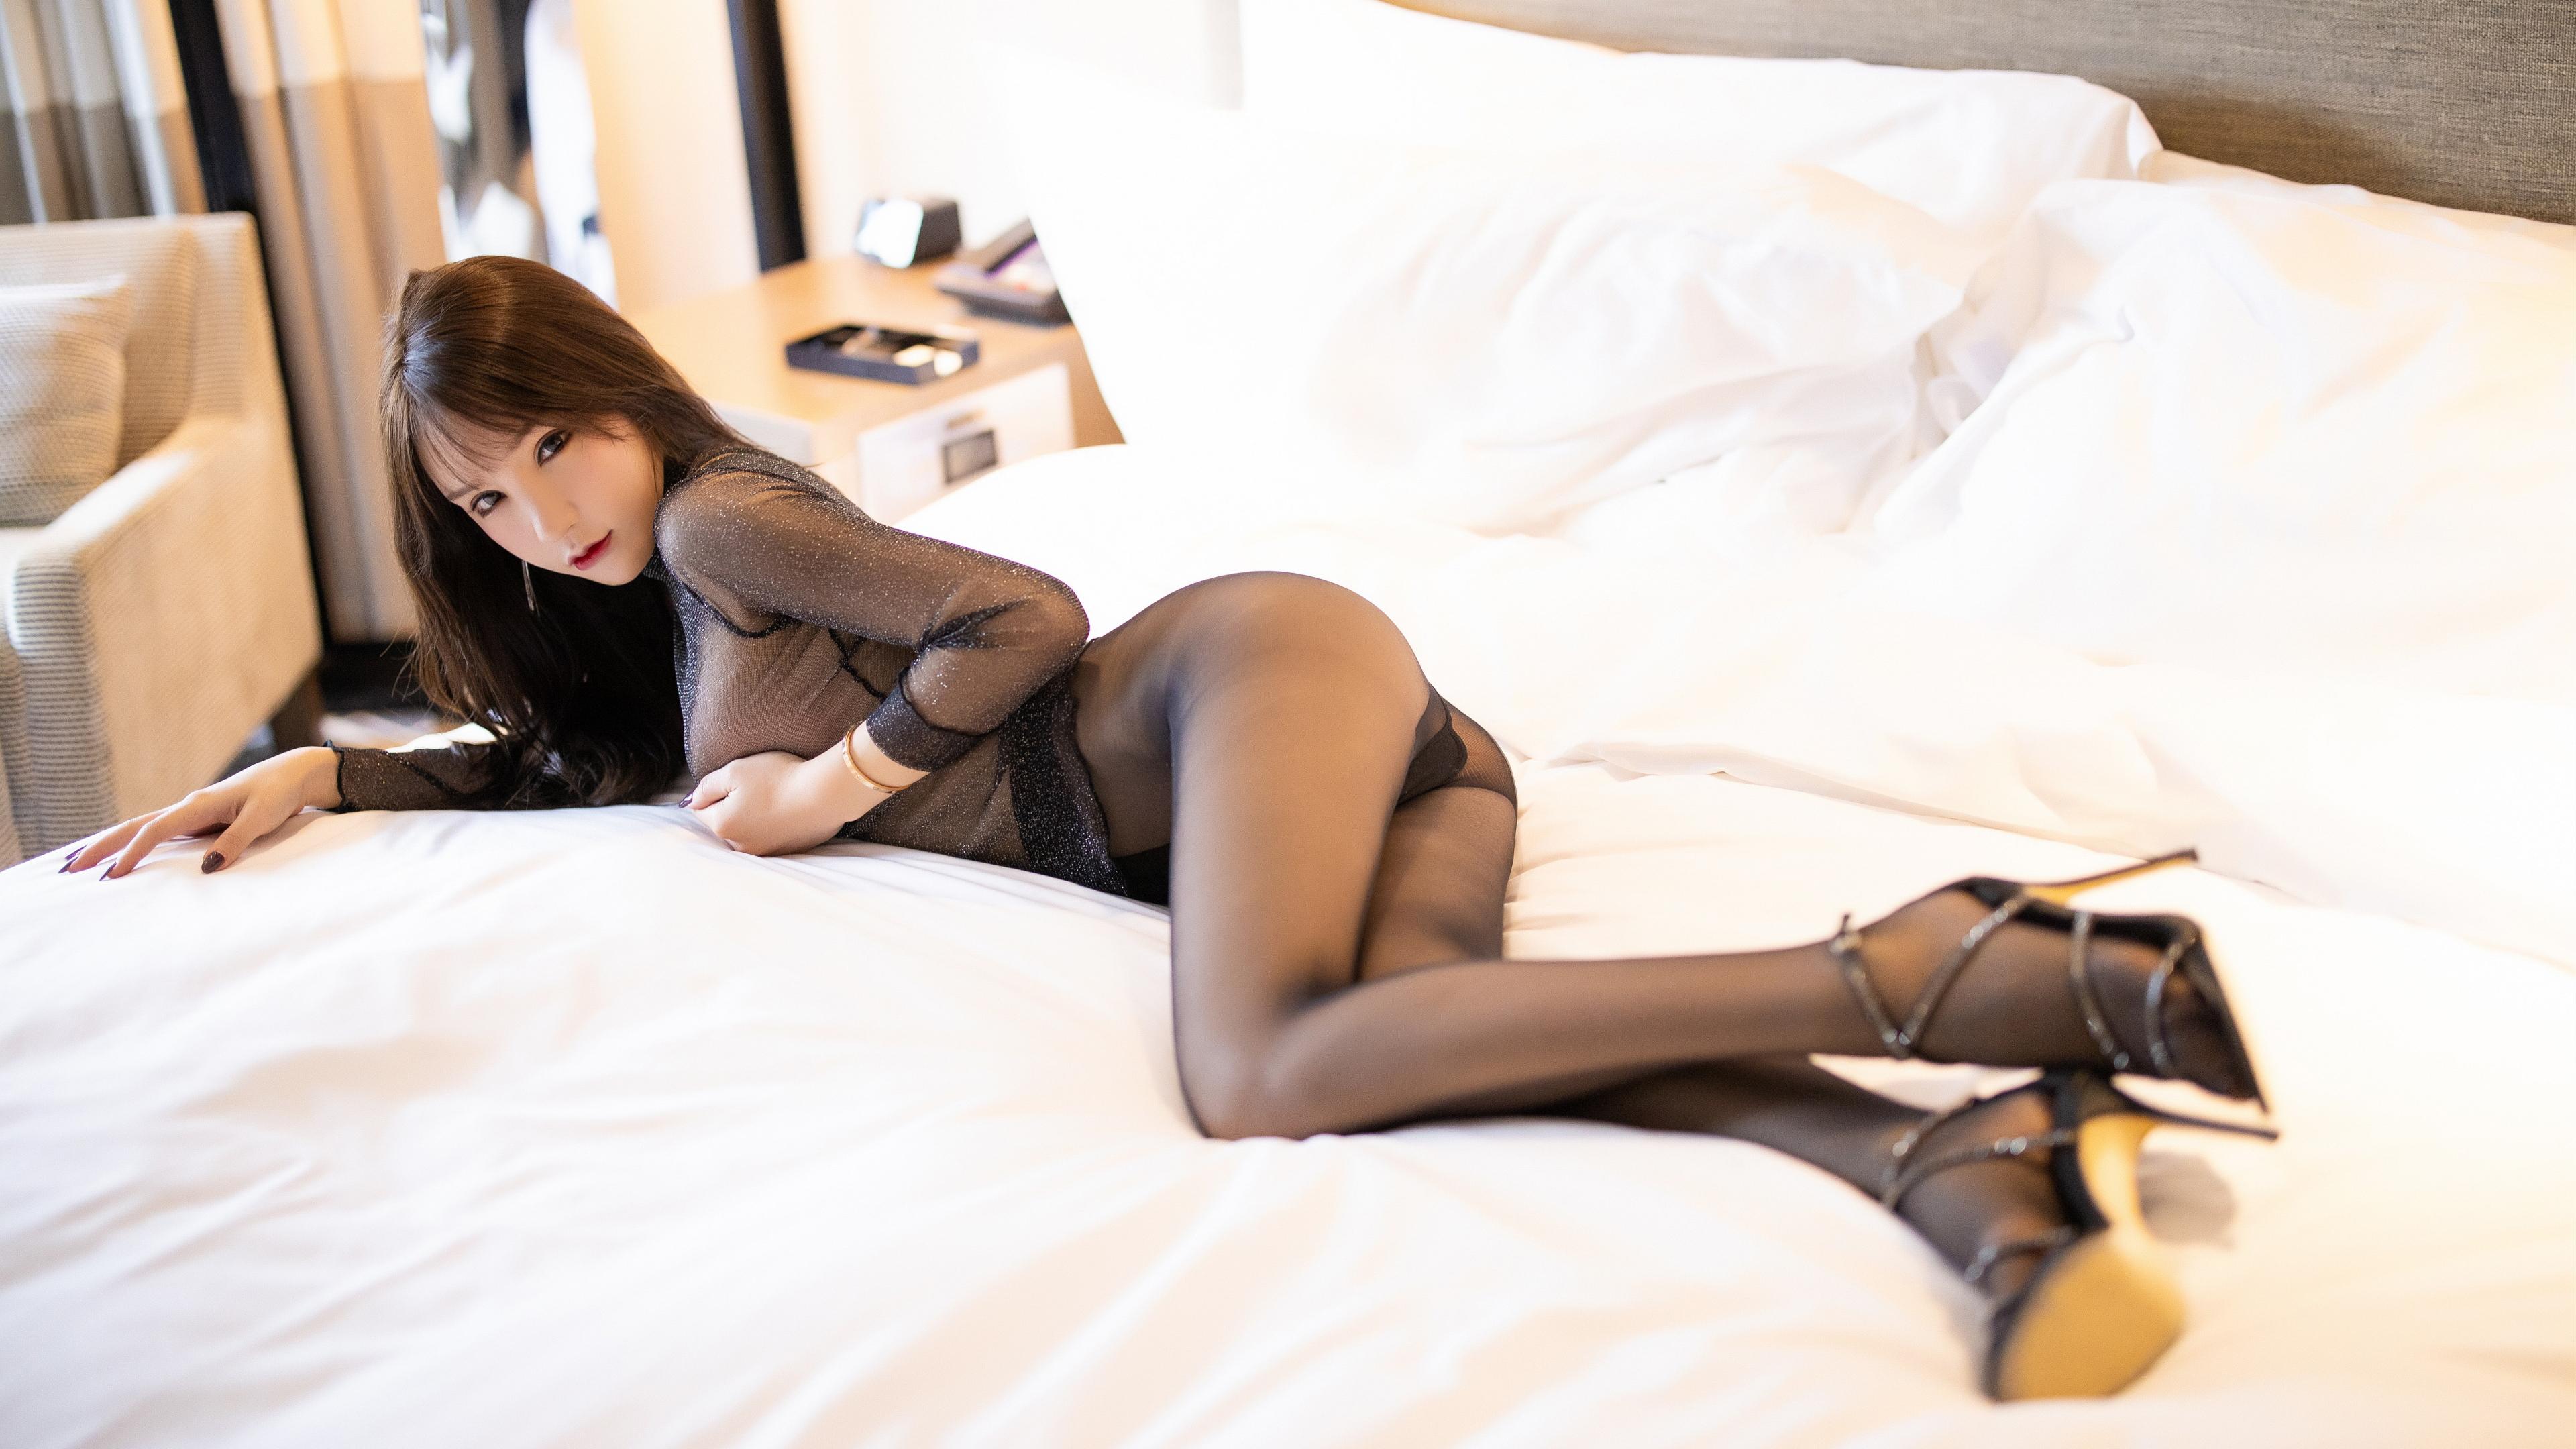 People 3840x2160 women Asian model pantyhose high heels long hair